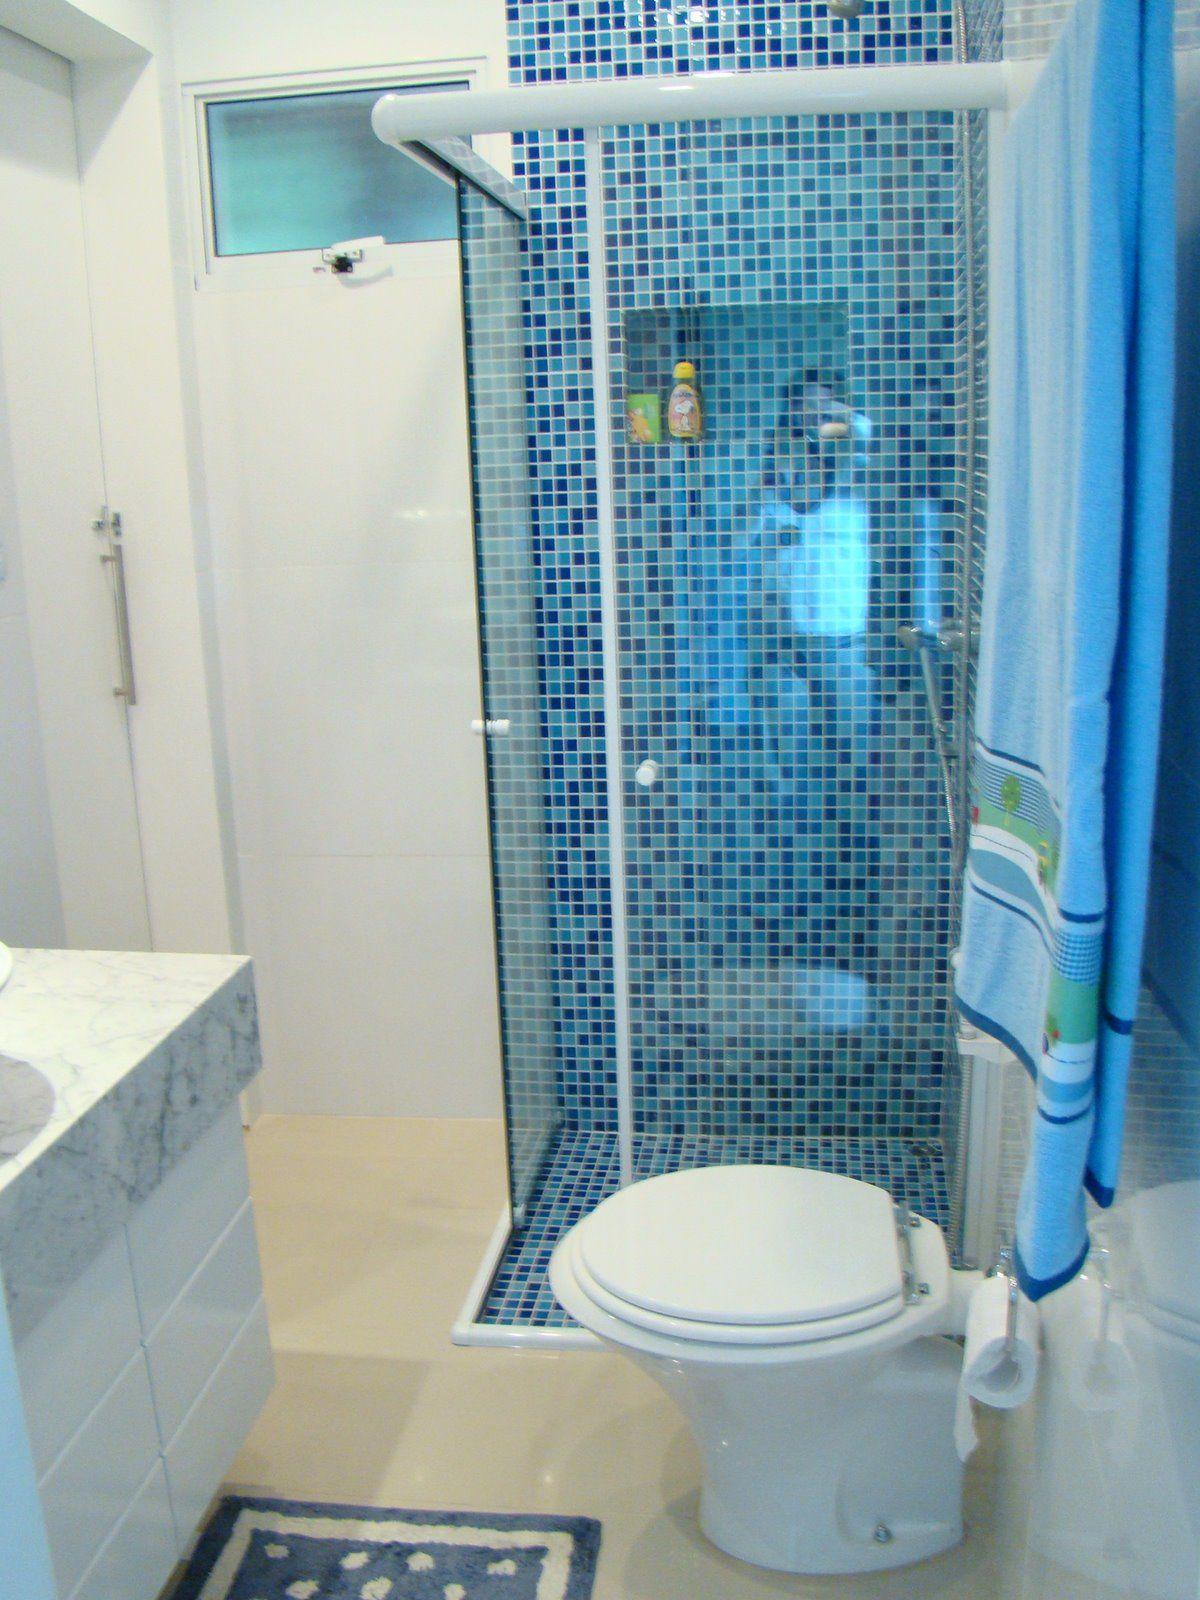 Pastilha azul  BANHEIROS PEQUENOS  Pinterest  Pastilhas, Pastilha vermelha -> Cuba Para Banheiro Azul